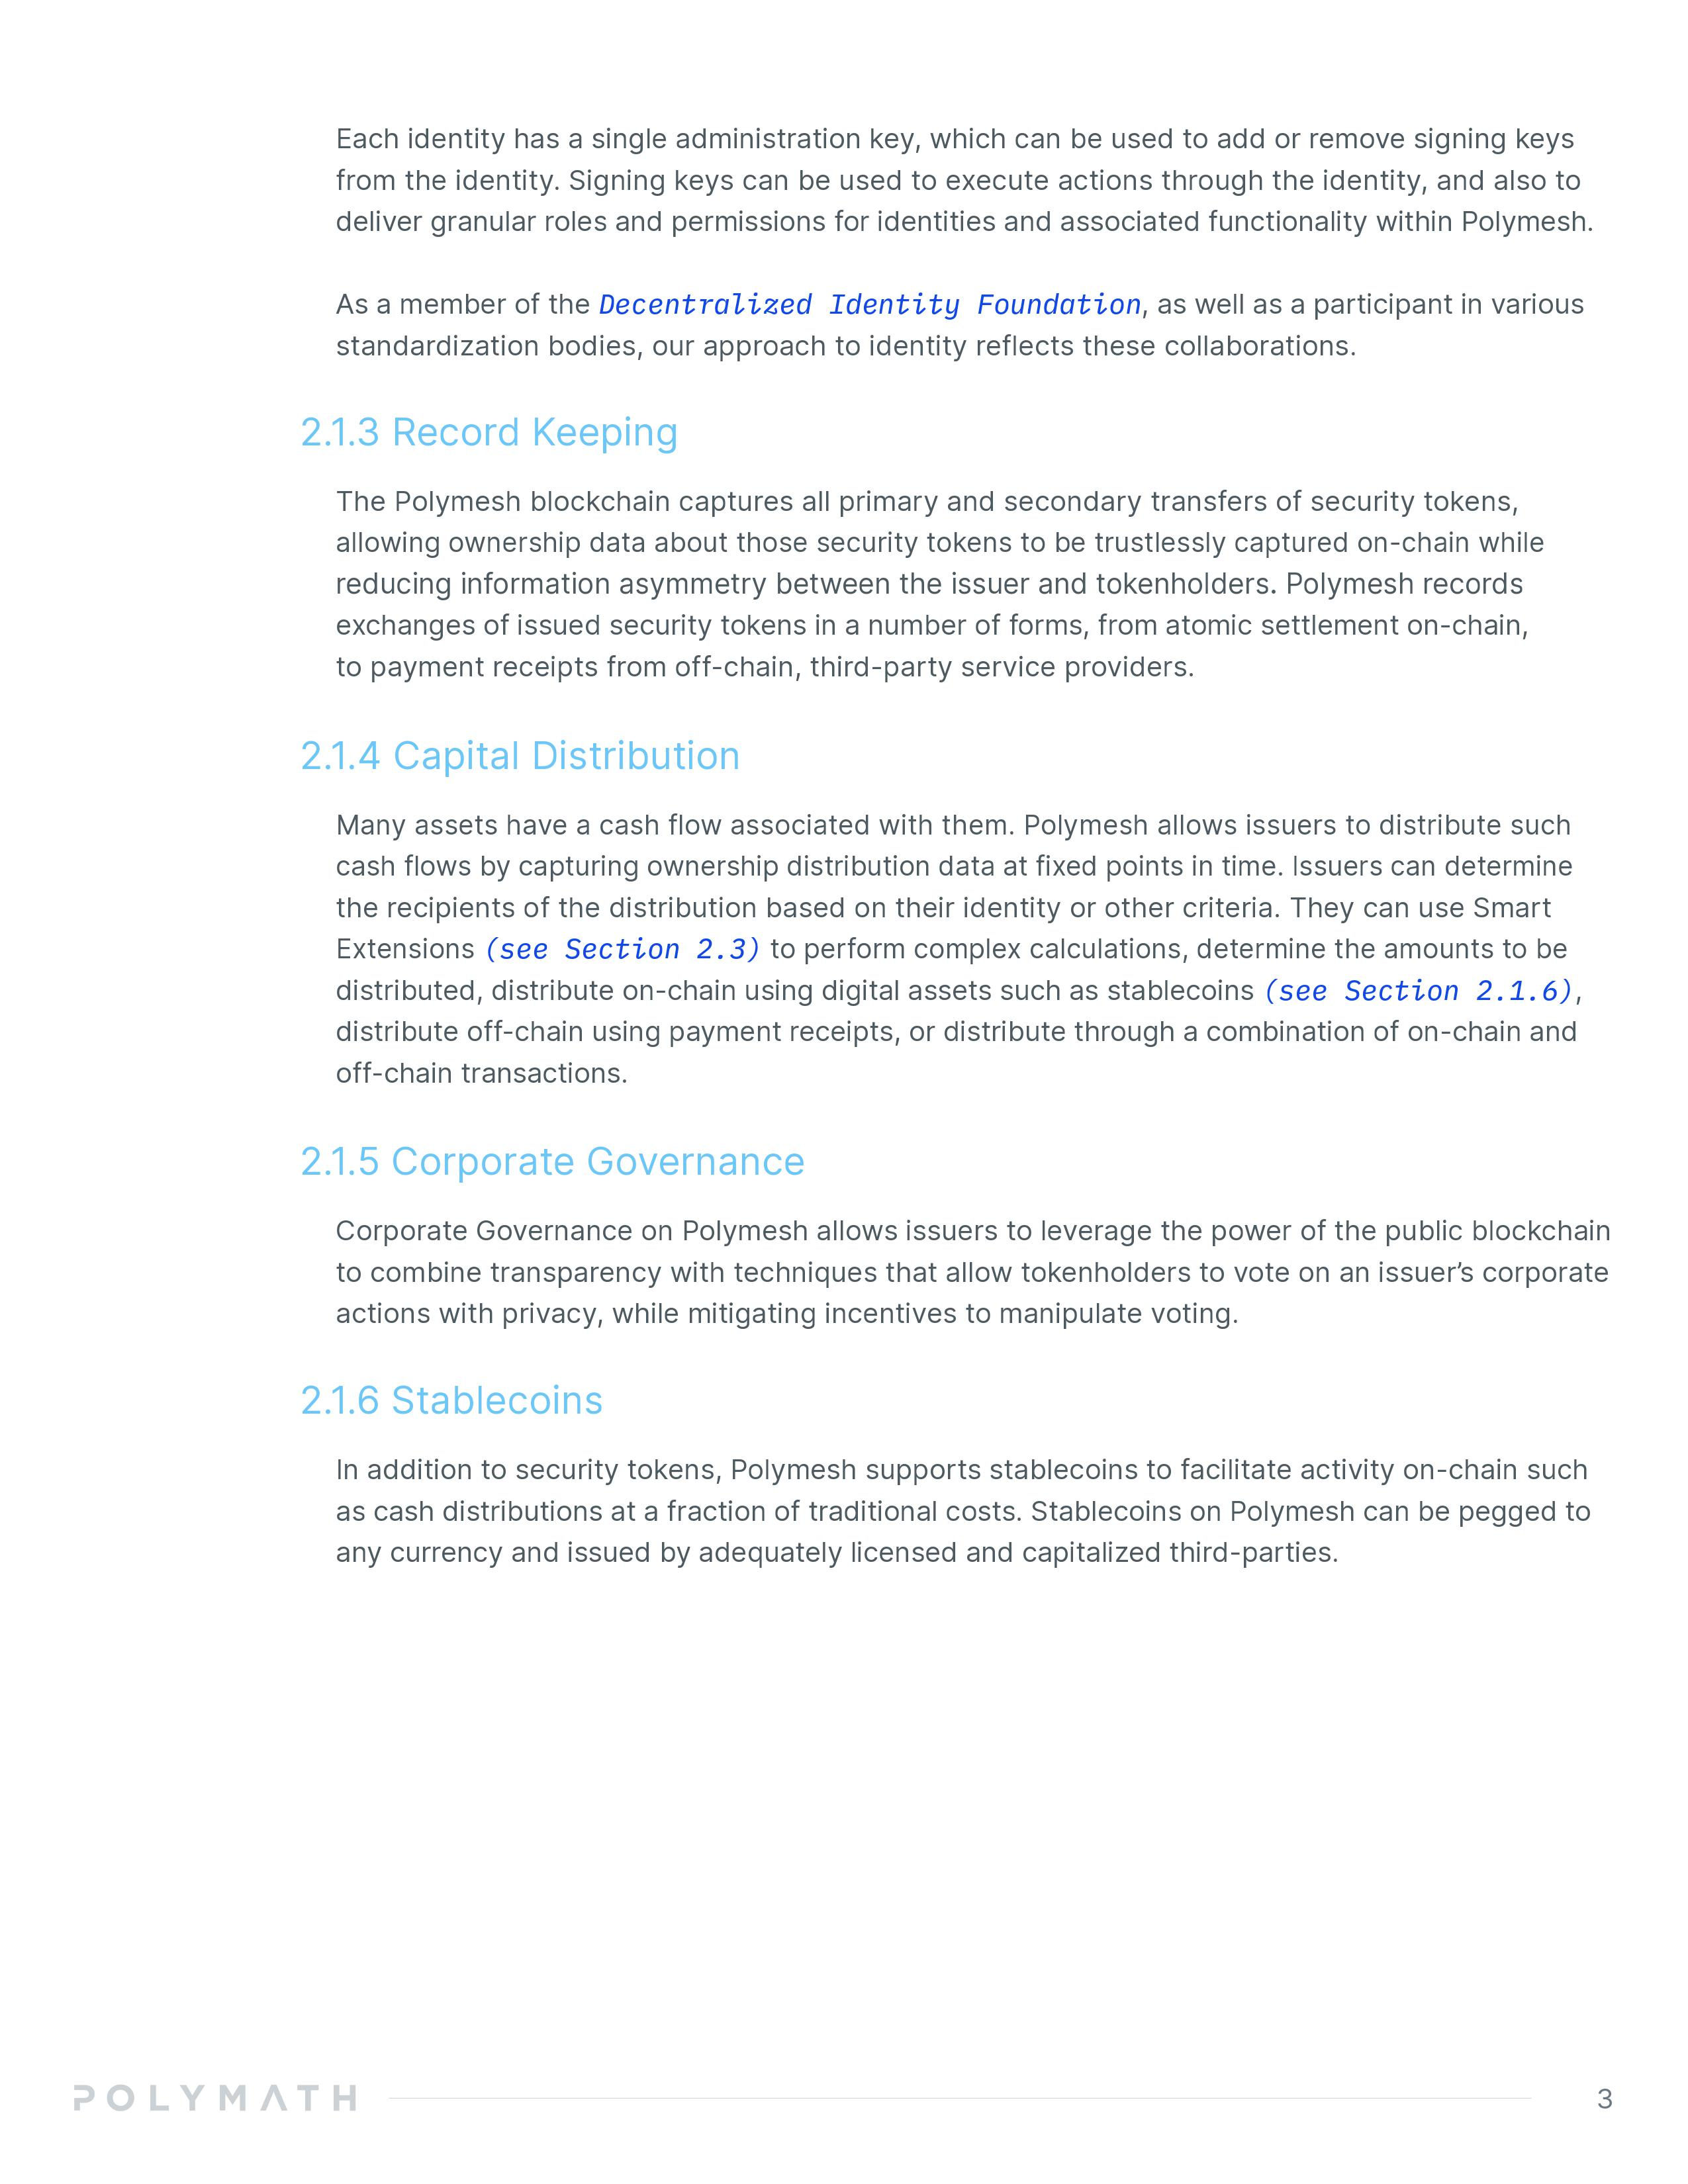 Polymath Whitepaper Page 7